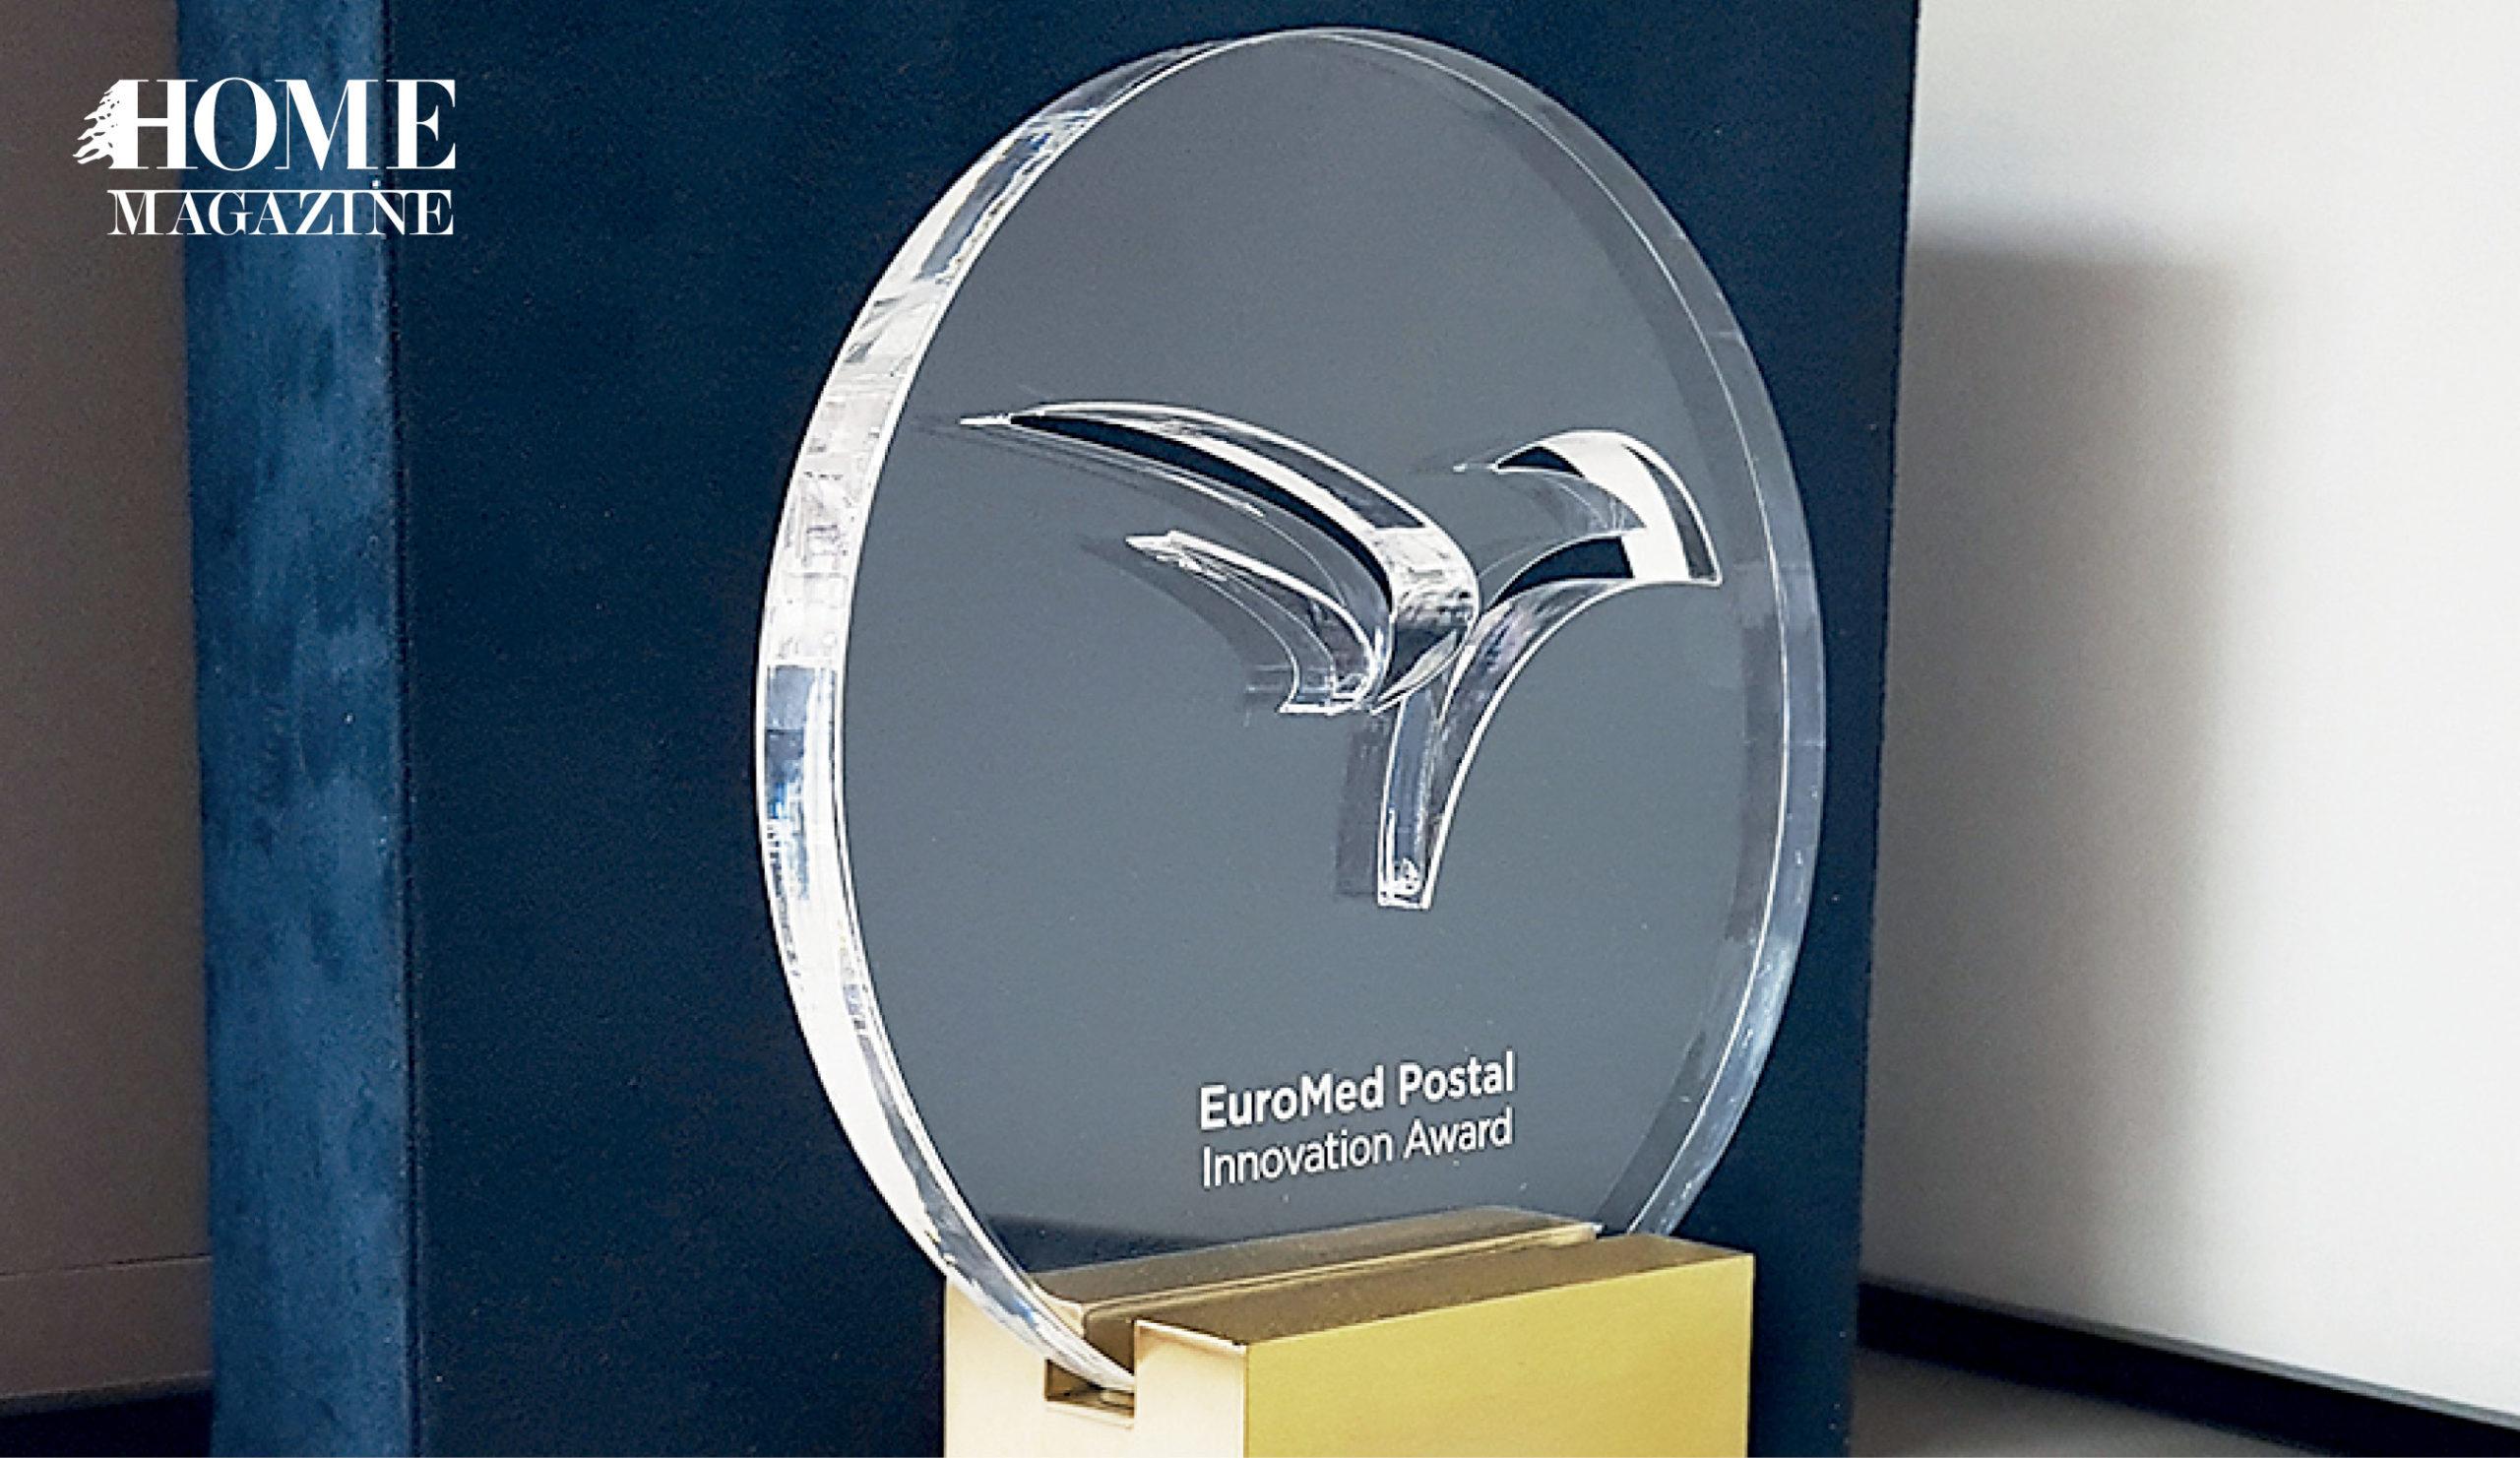 Circular glass trophy